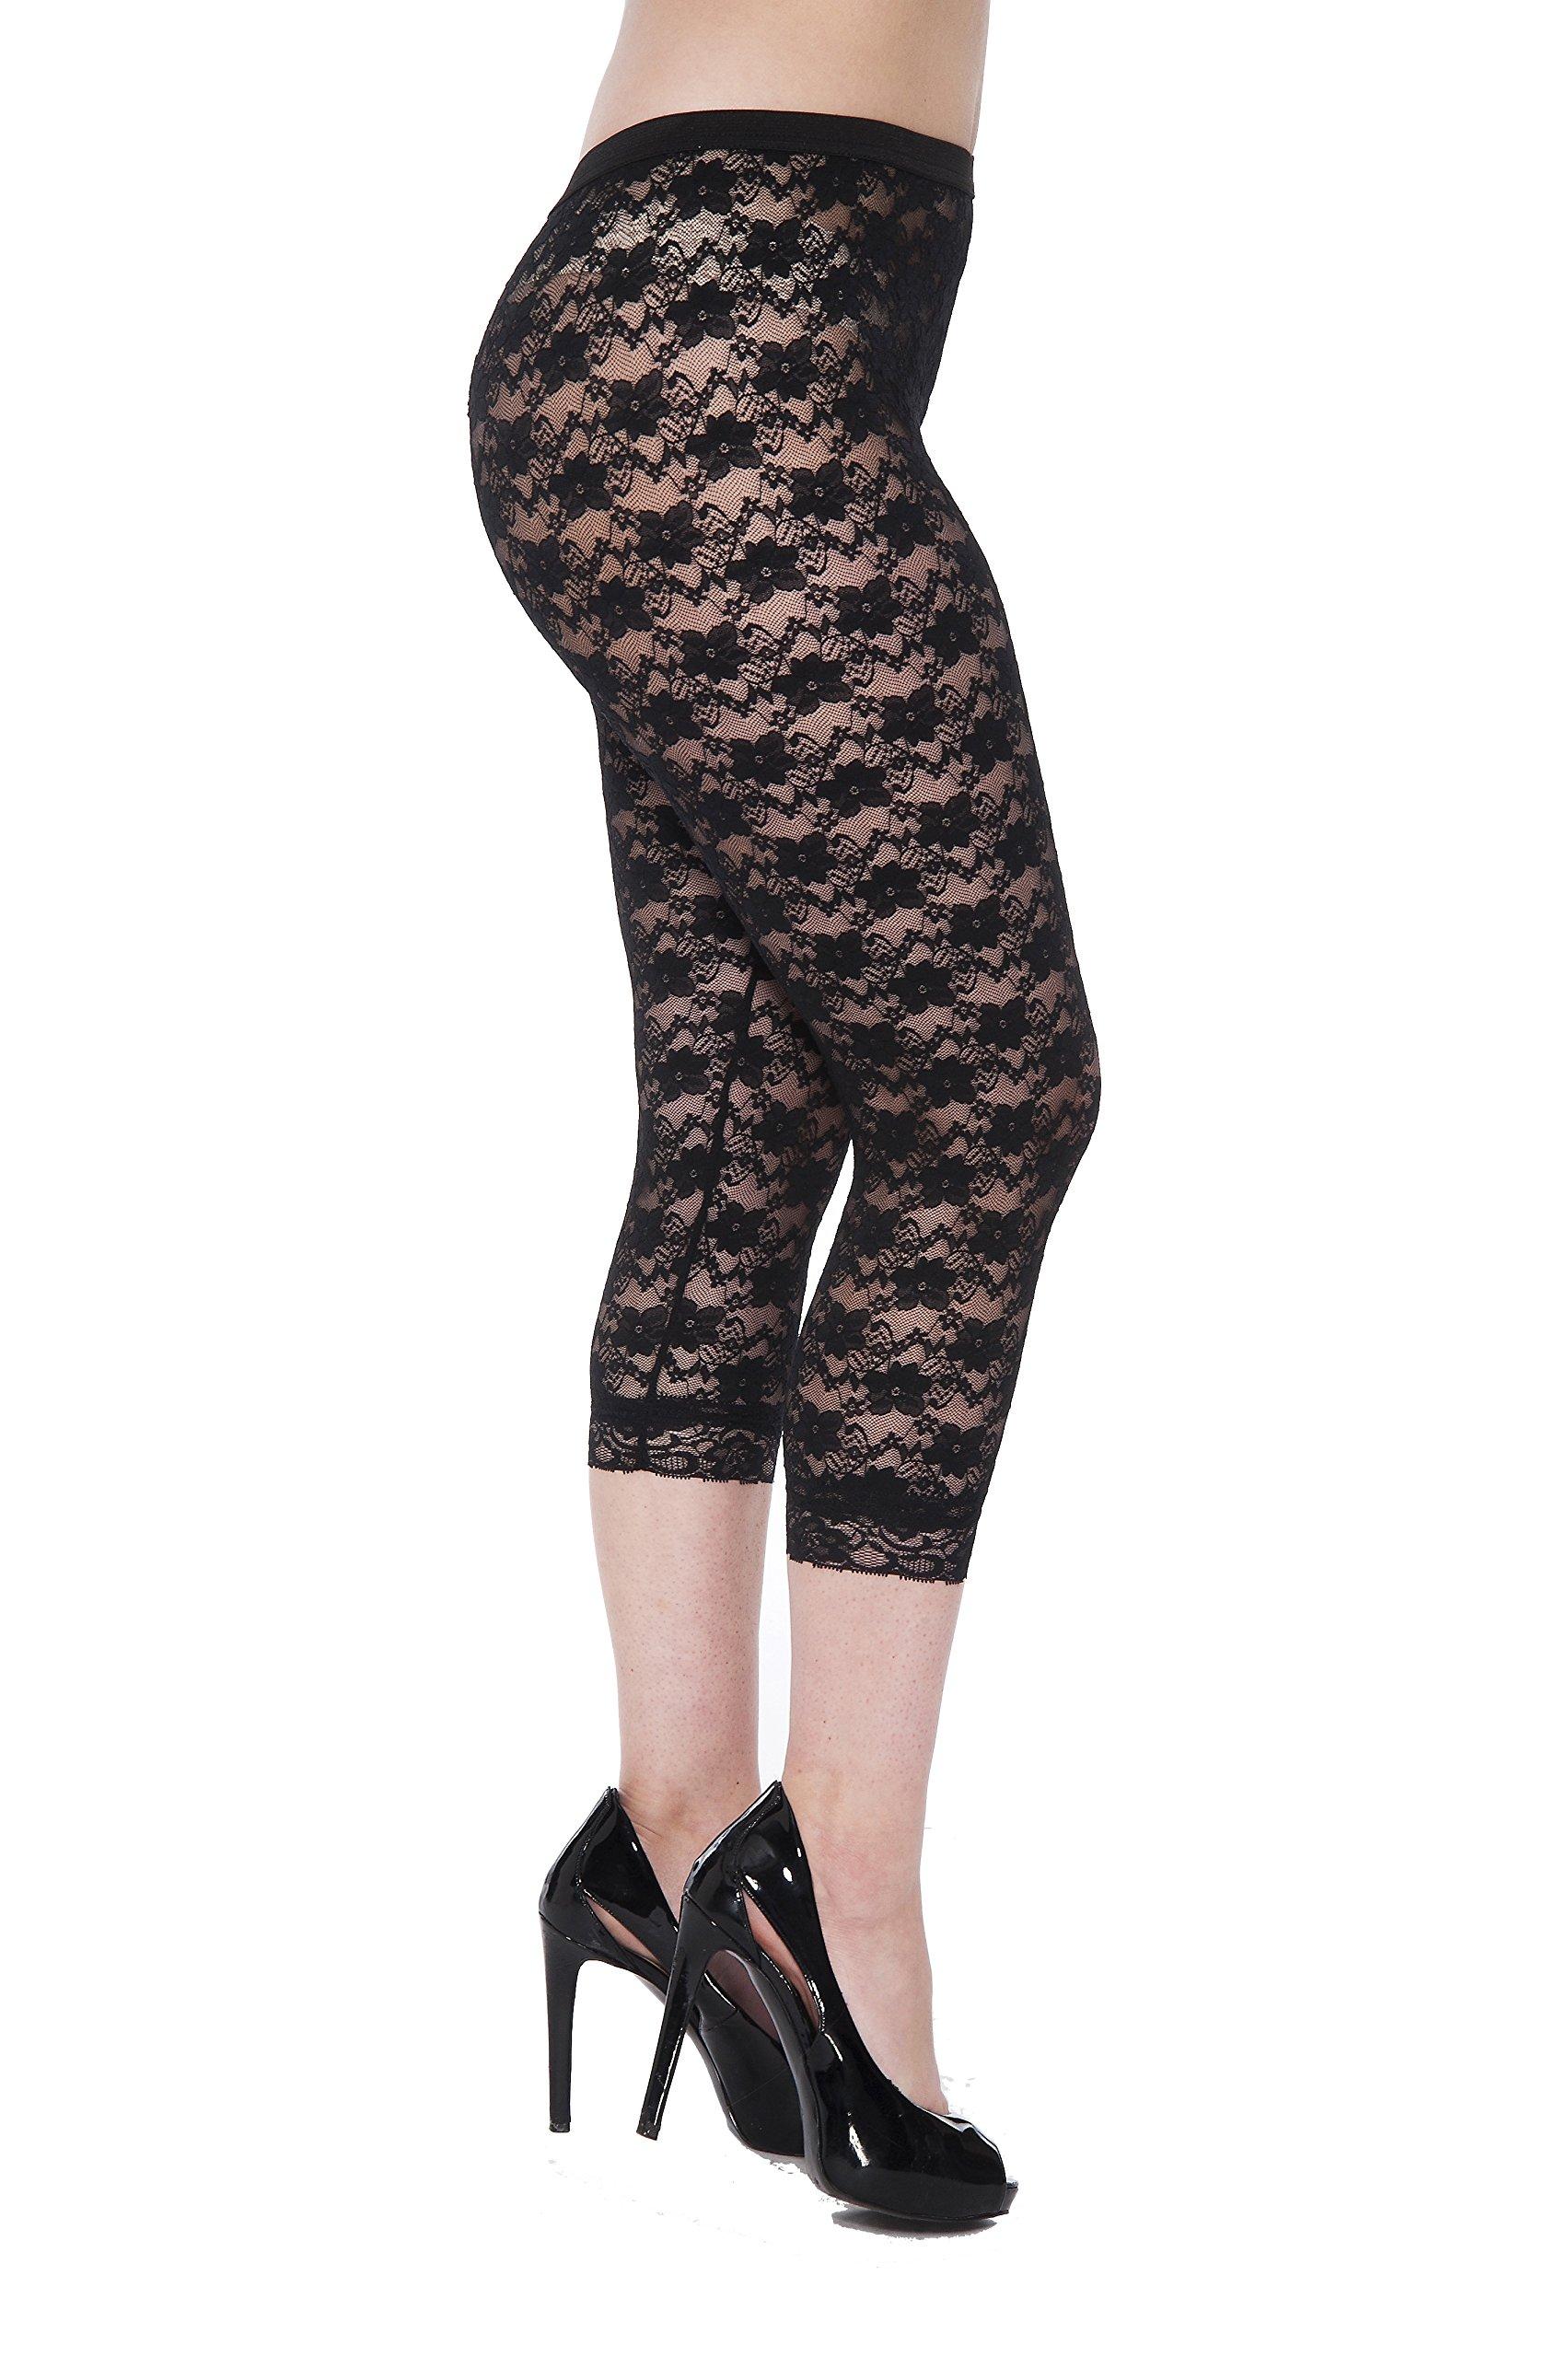 Unique Styles Lace Capri Leggings Tights - Assorted Styles & Colors, Black, Small